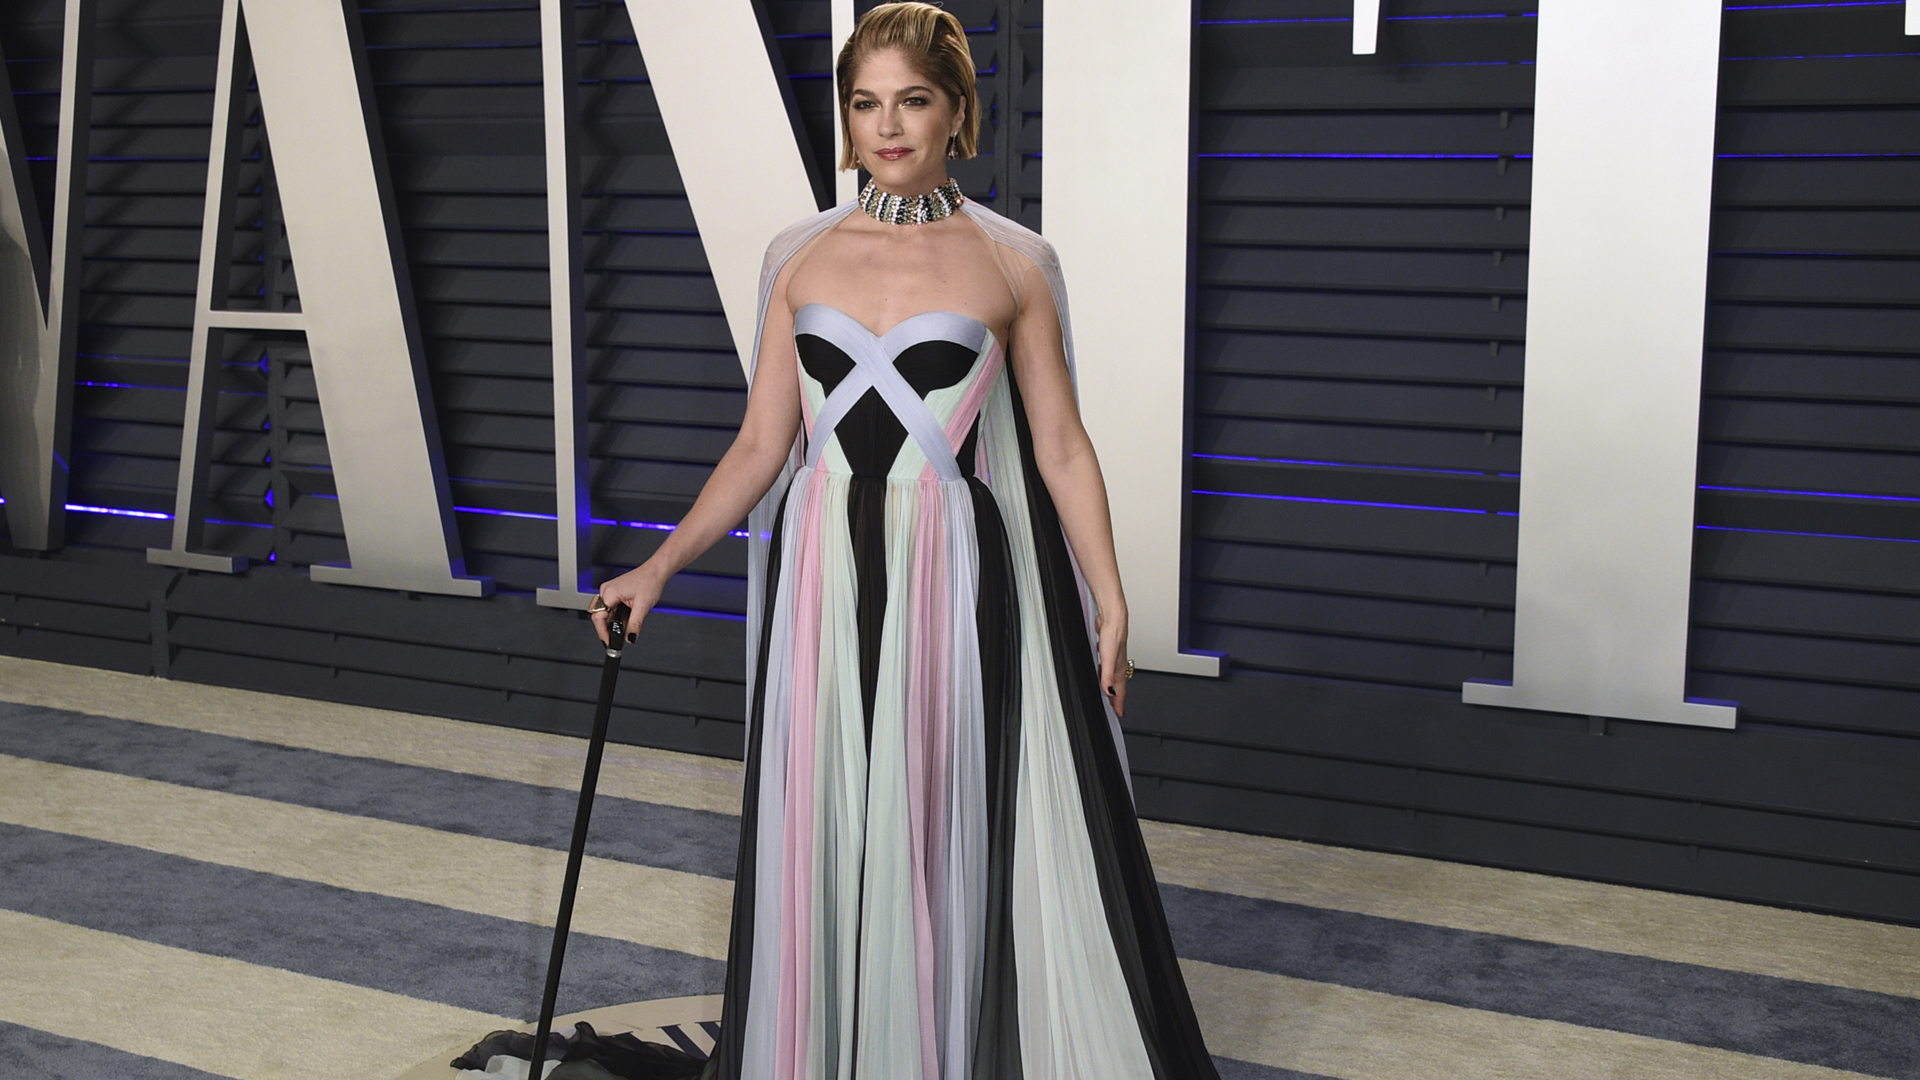 Selma Blair arrives at the Vanity Fair Oscar Party on Feb. 24, 2019, in Beverly Hills, Calif. (Evan Agostini/Associated Press